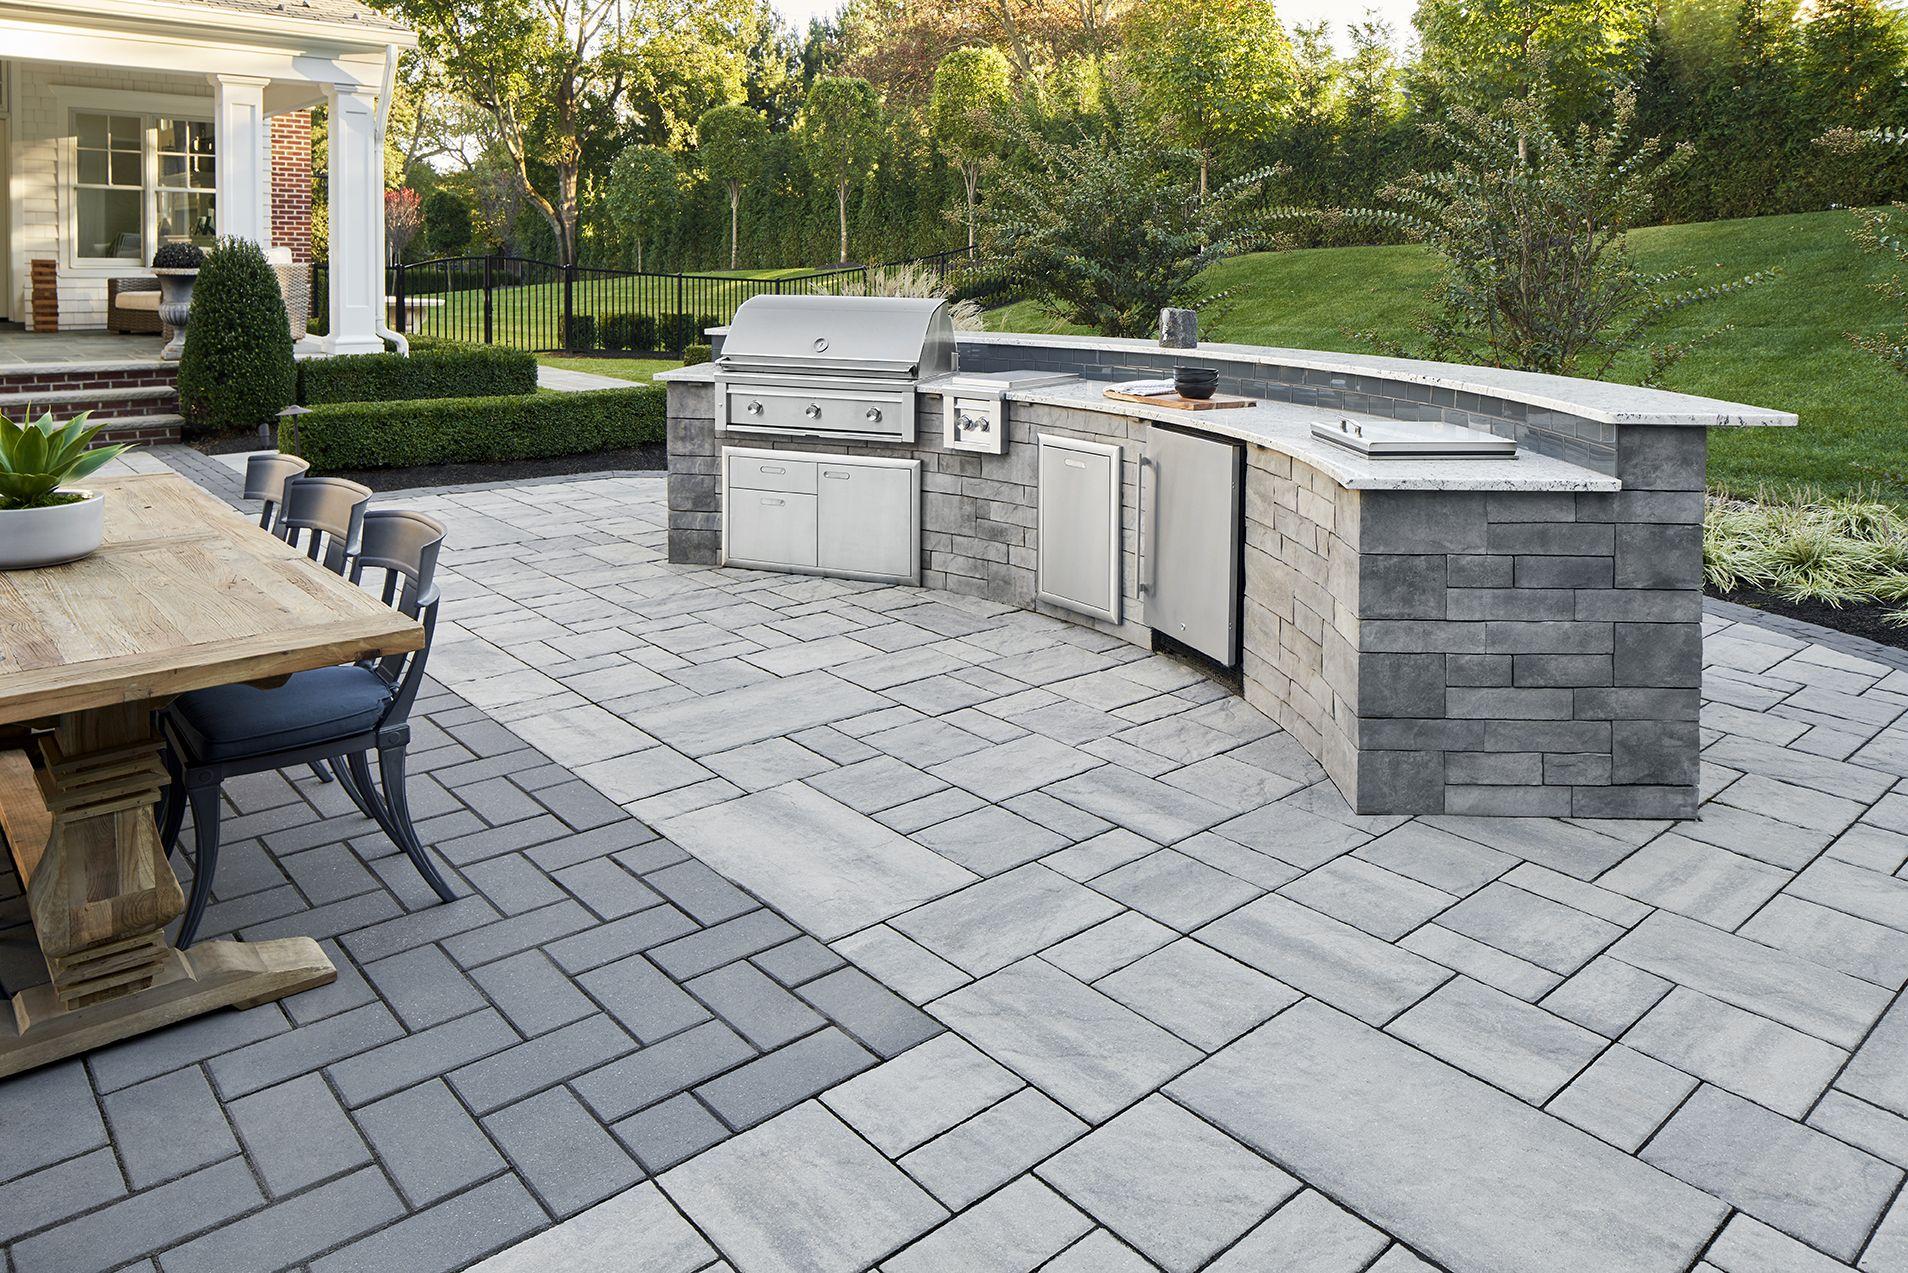 46+ Backyard paving stone ideas info